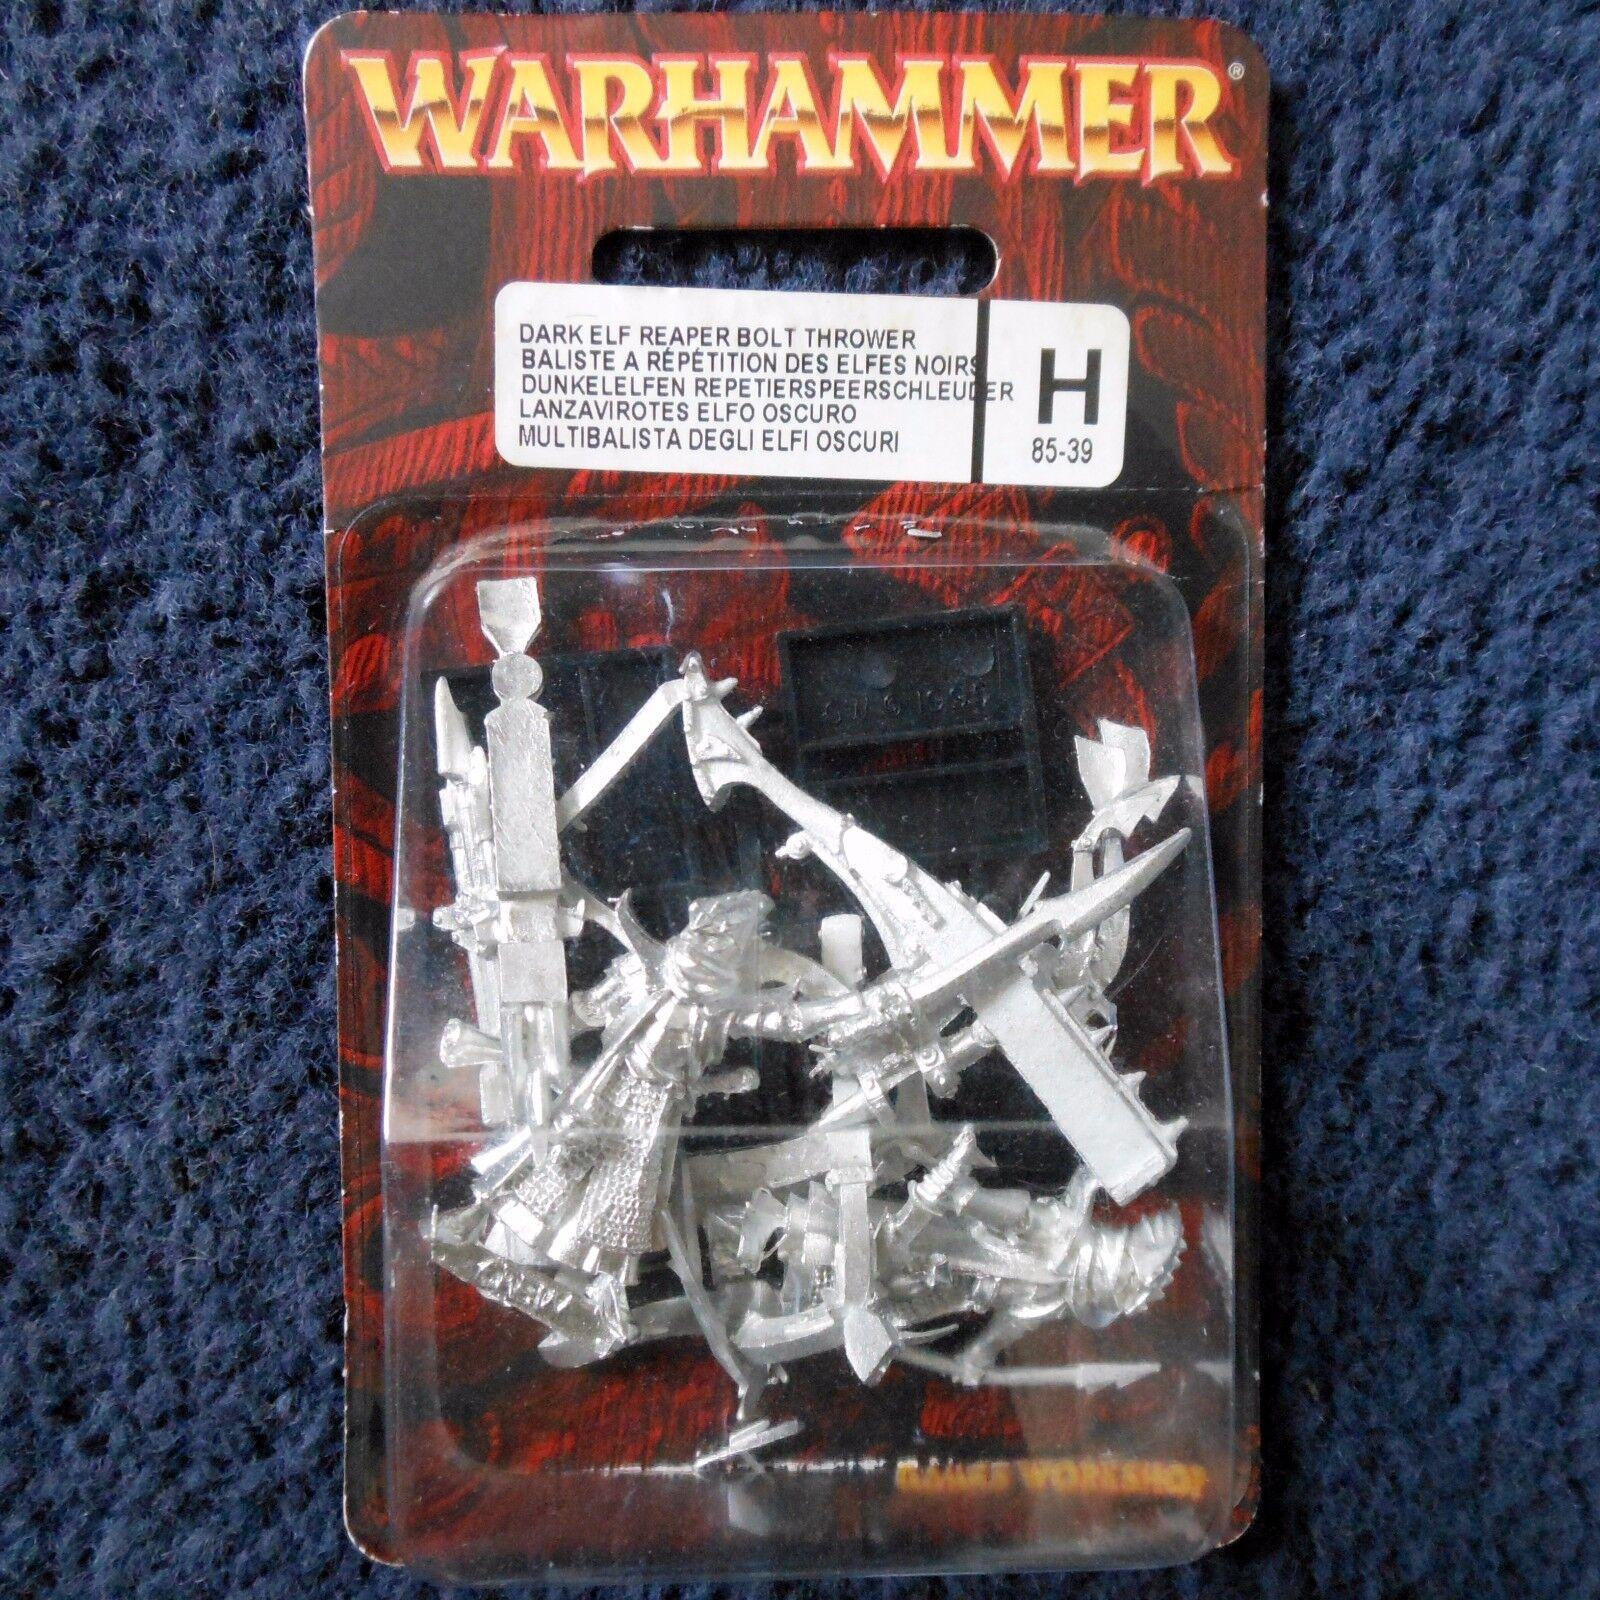 2002 Dark Elf Reaper Bolt Thrower Citadel Repeating Repeater Xbow Warhammer MIB